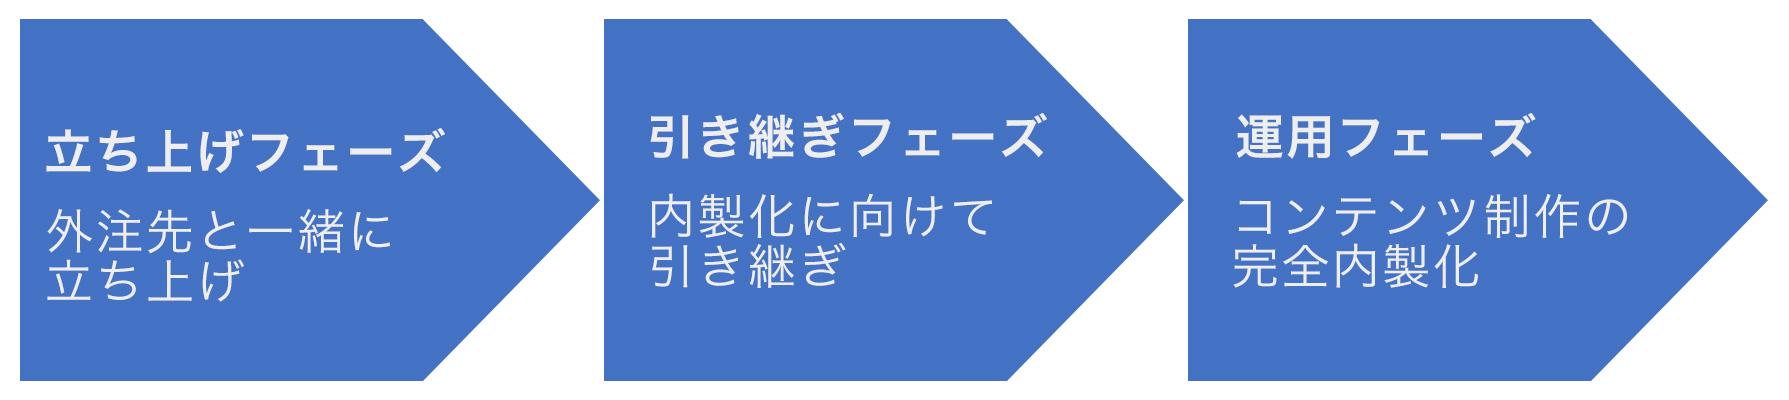 column_200221_01.jpg